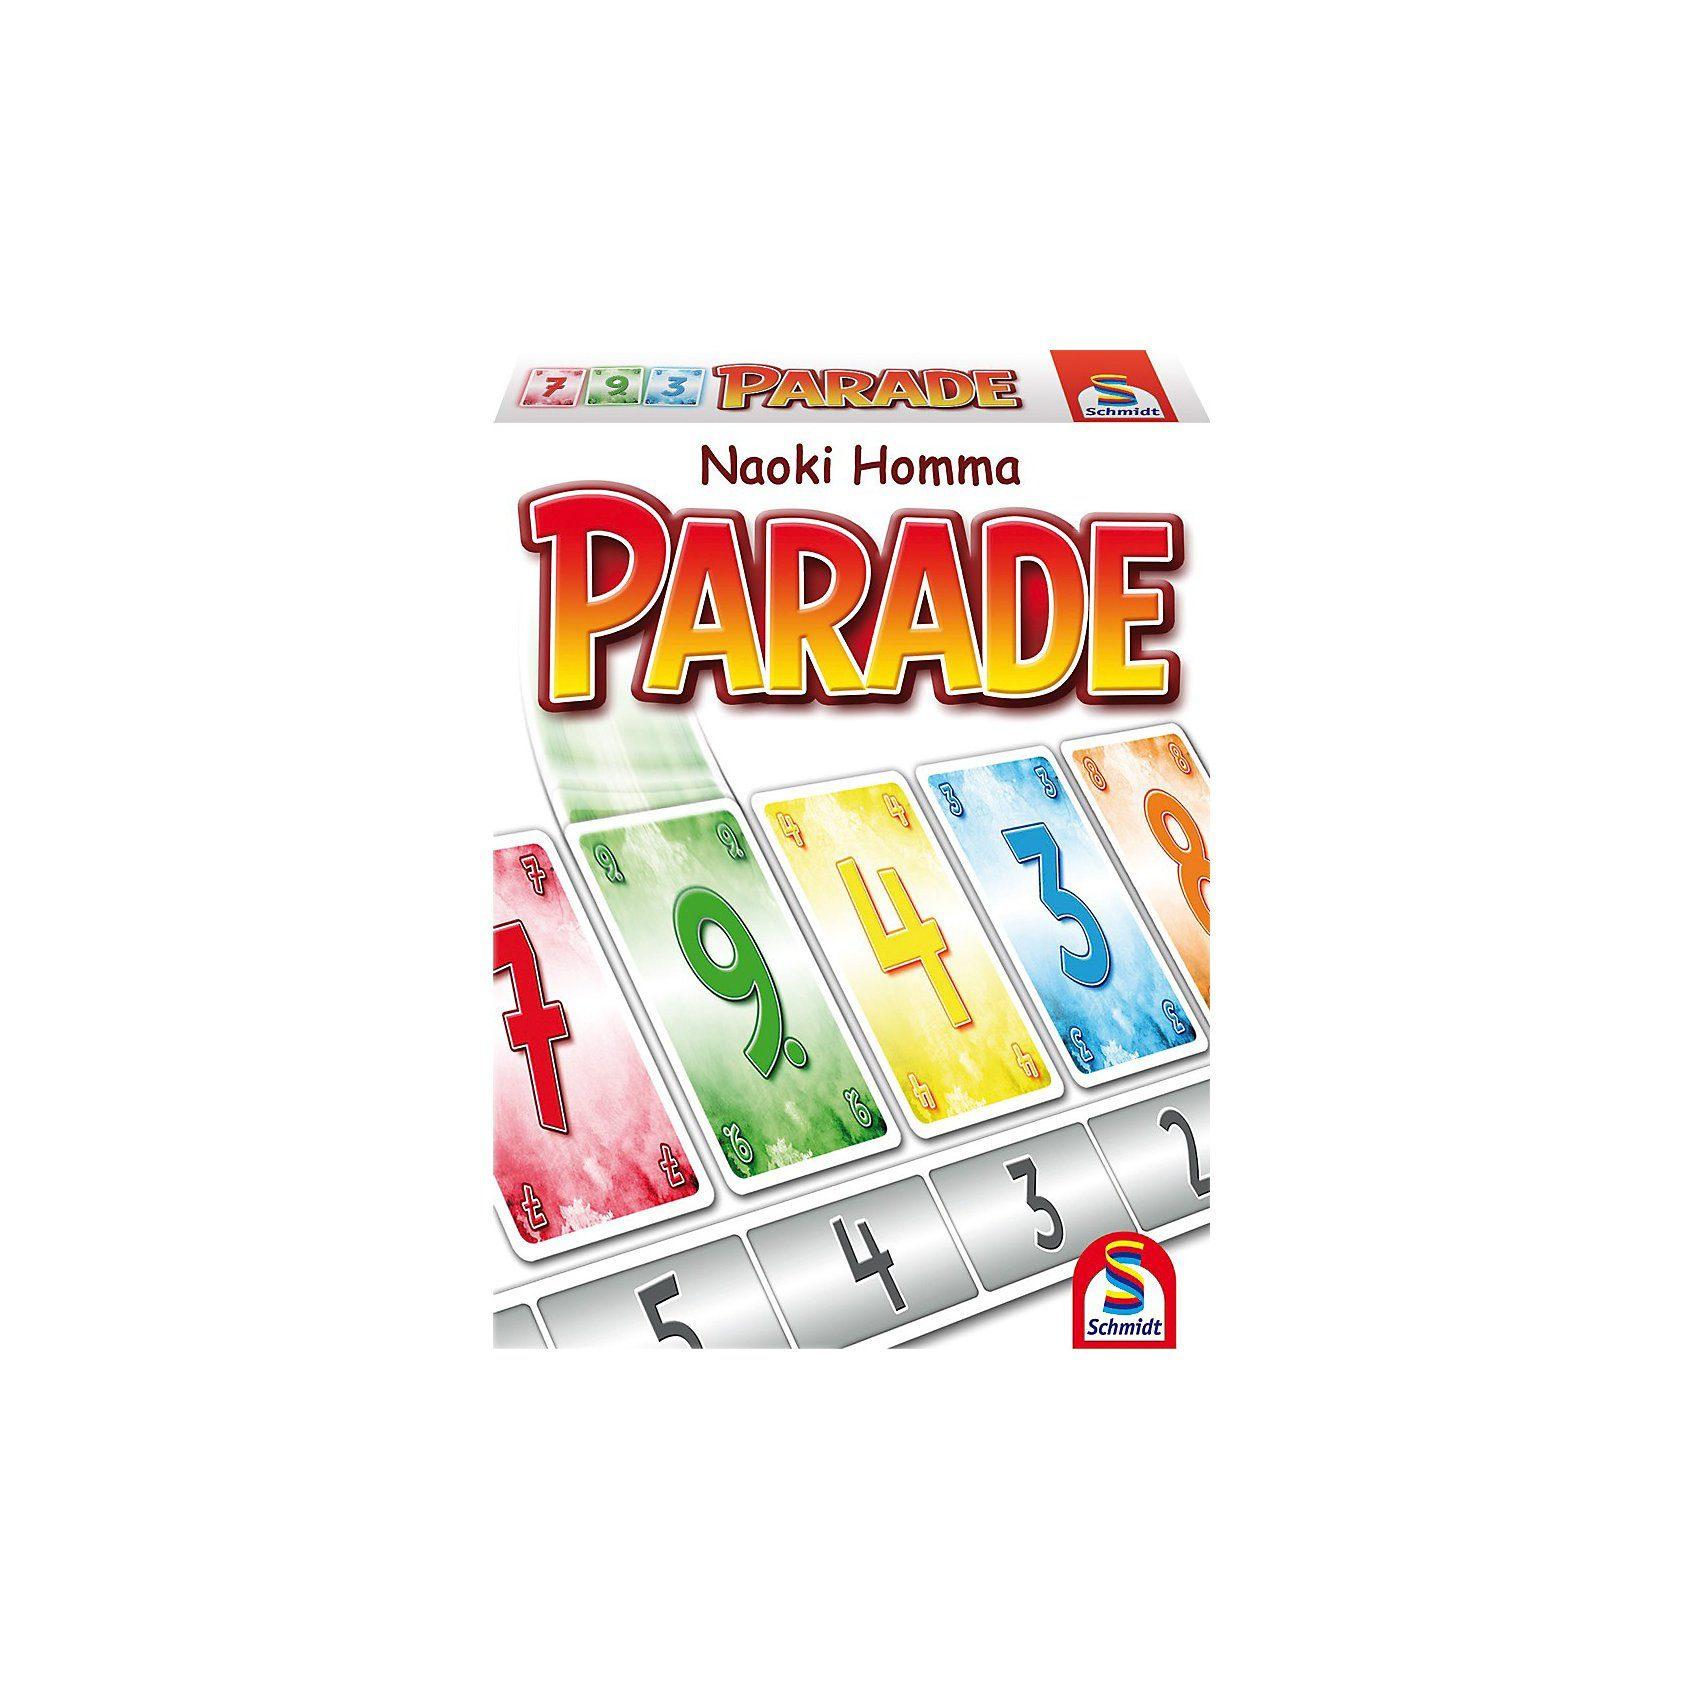 Schmidt Spiele Kartenspiel Parade